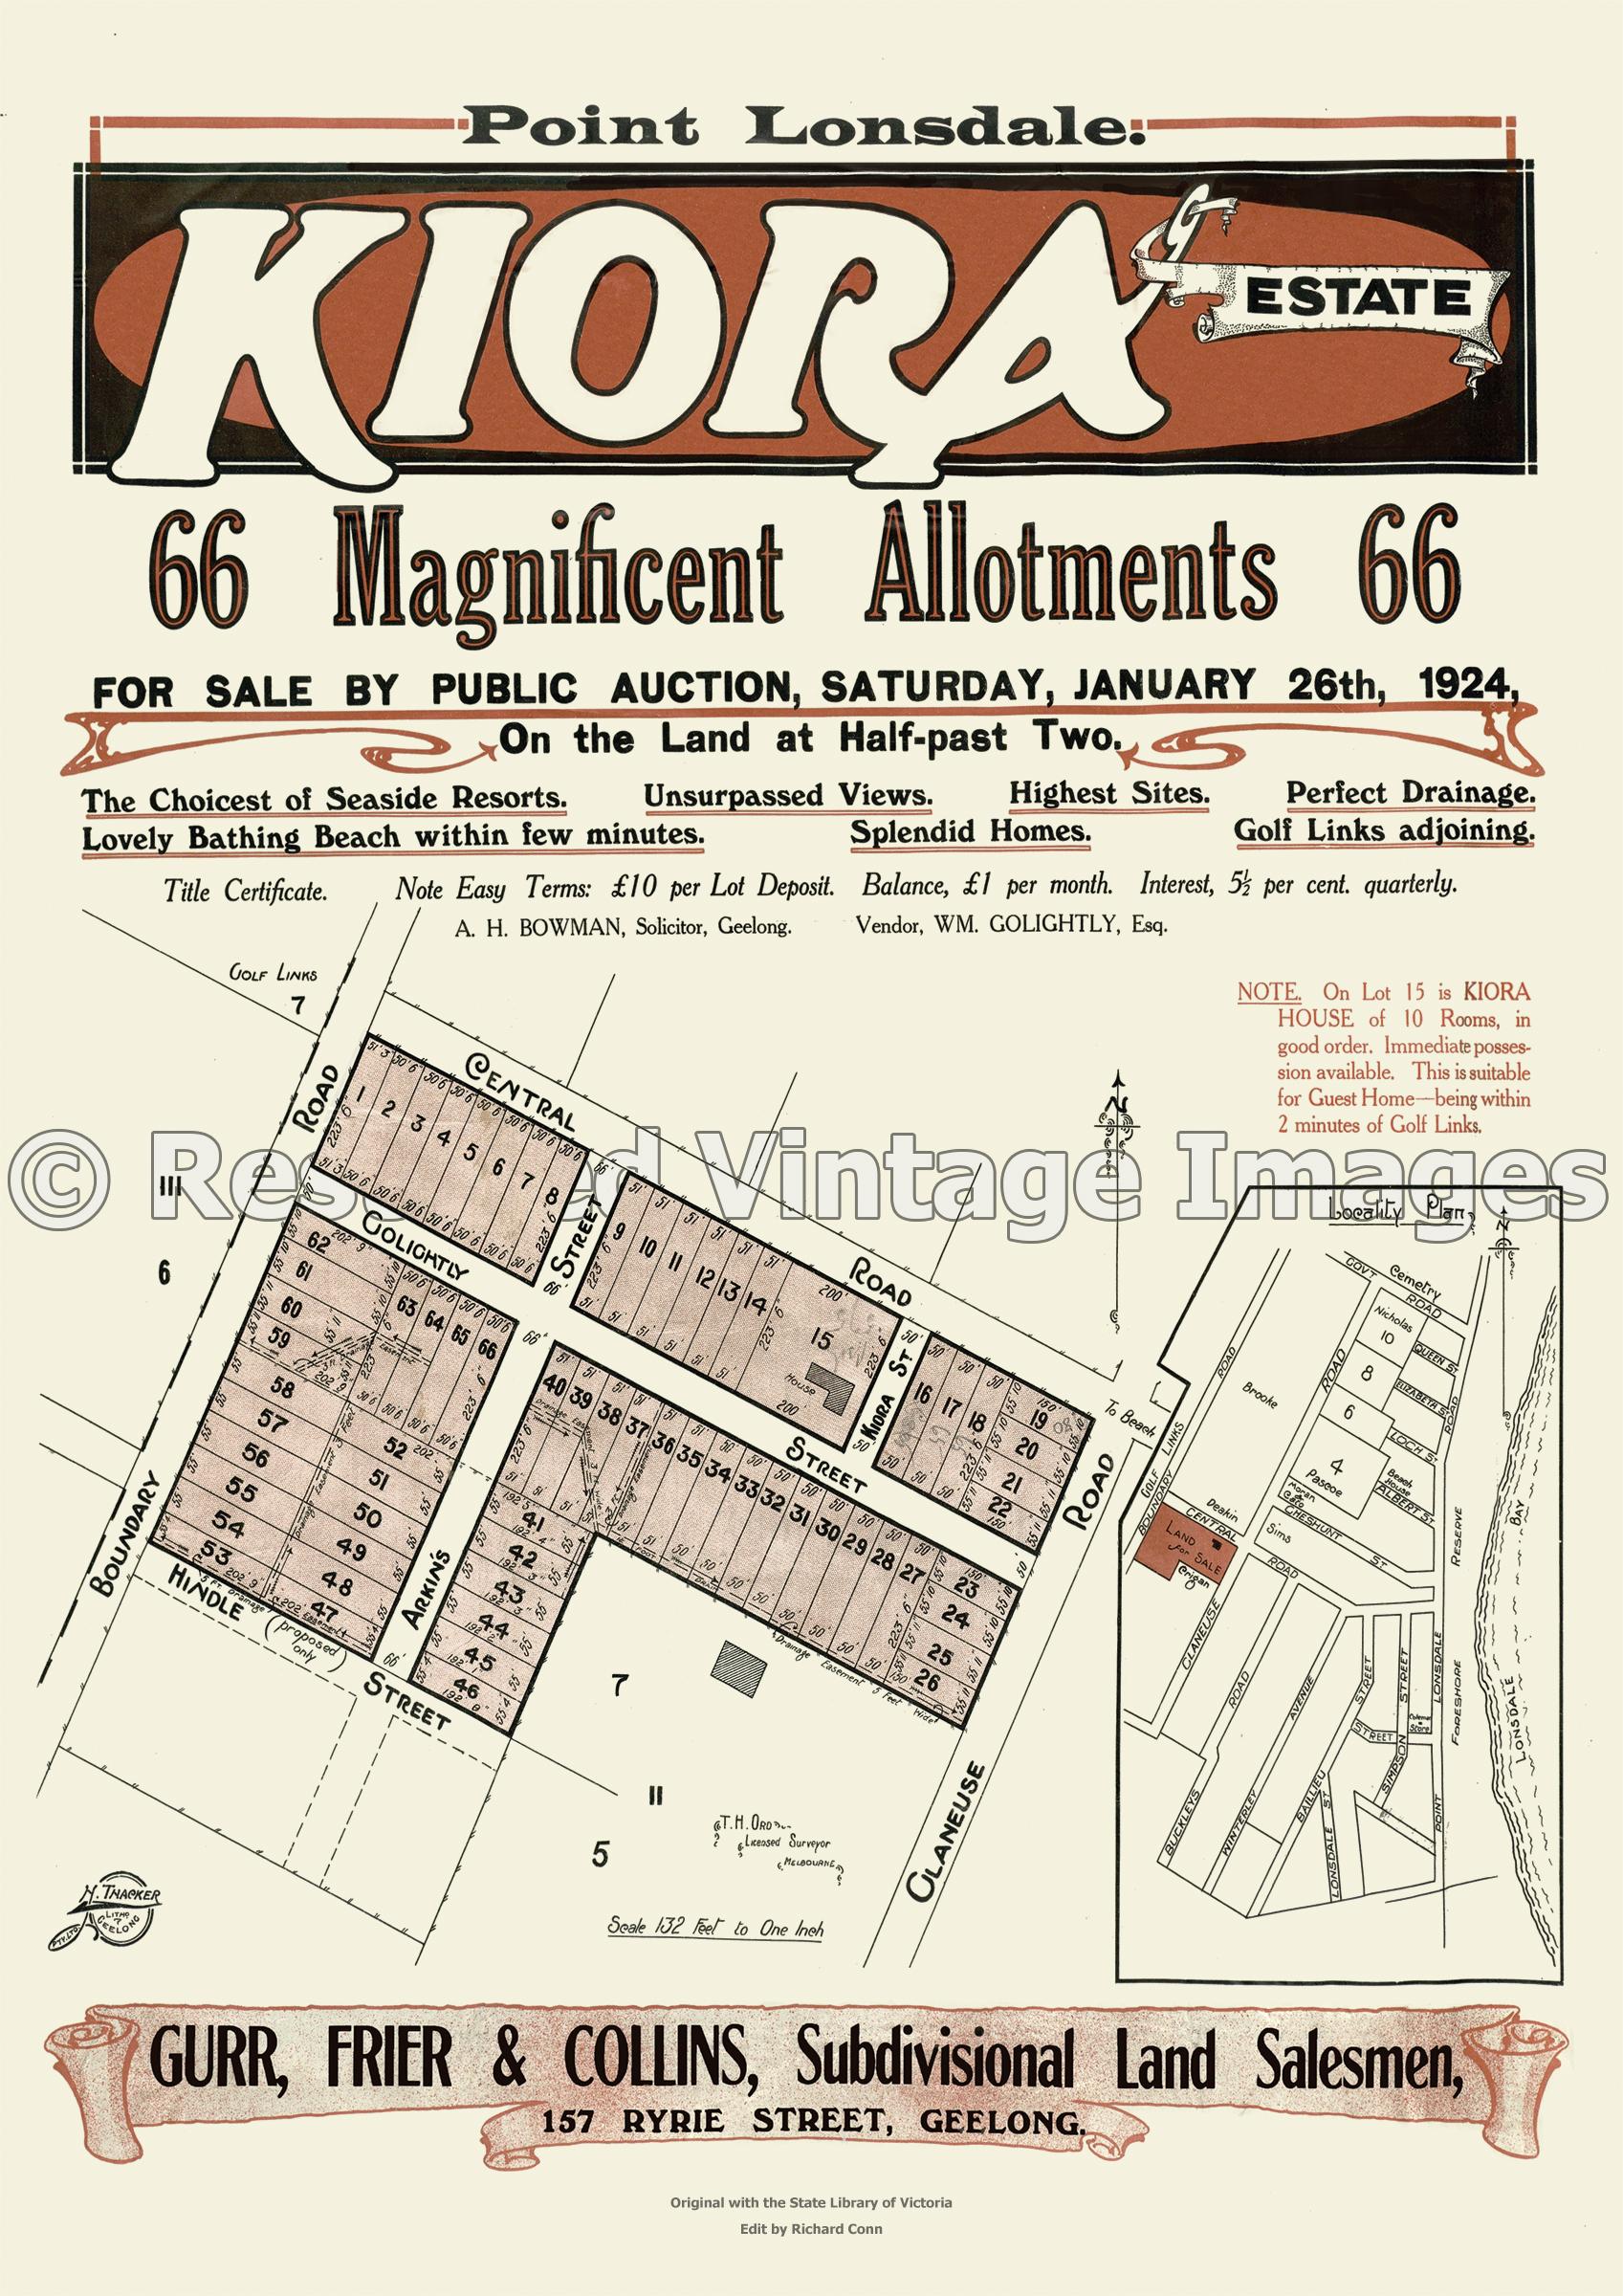 Kiora Estate 26th January 1924 – Point Lonsdale